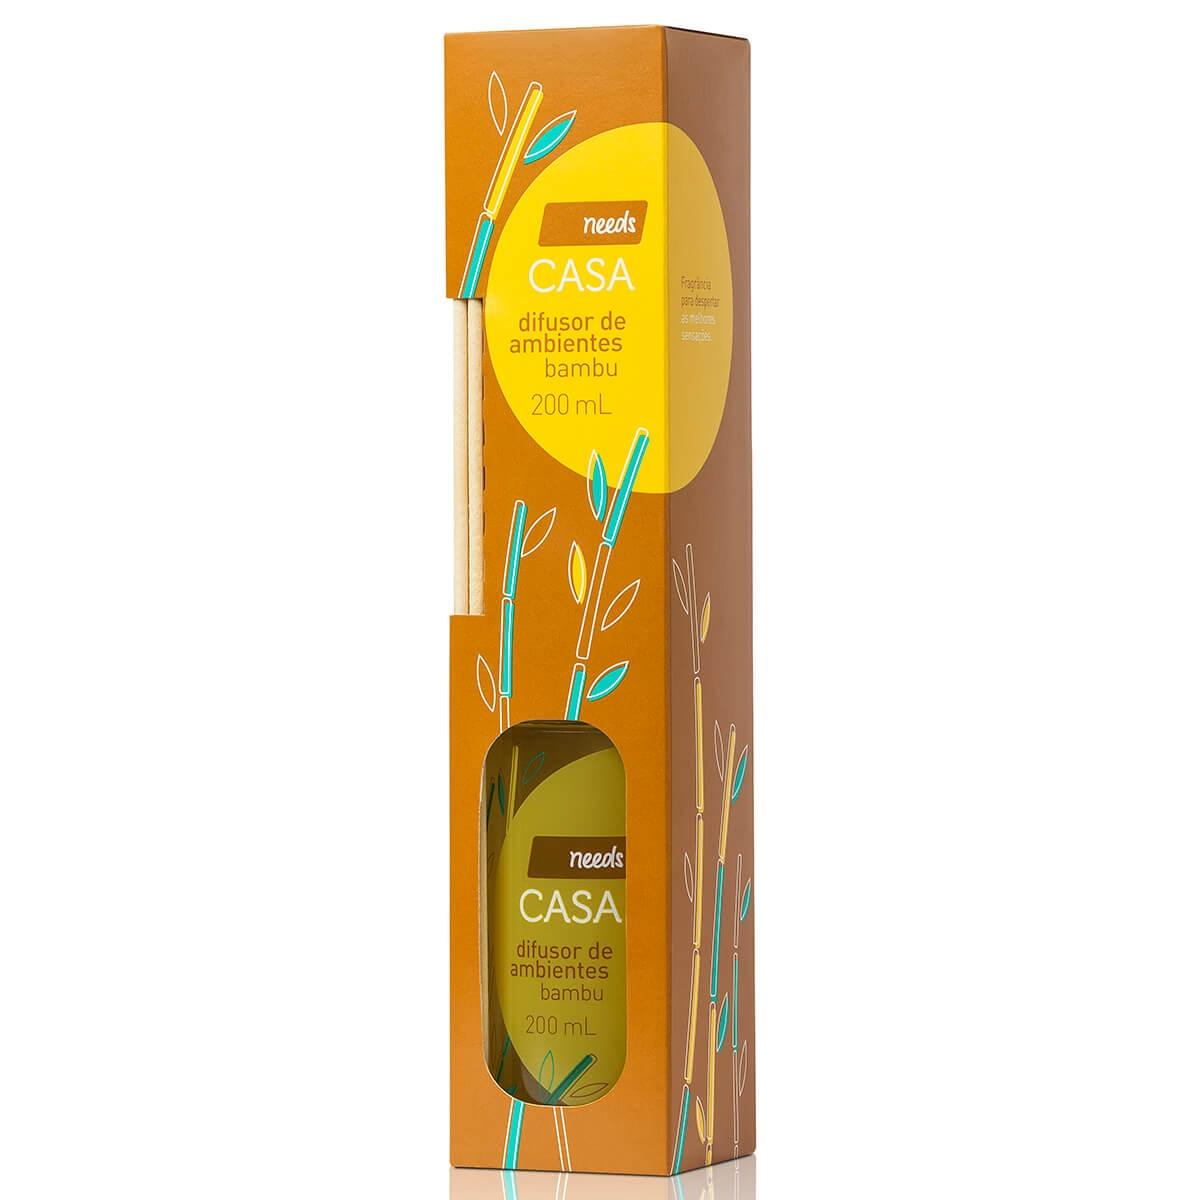 Difusor de Ambientes Needs Casa Bambú 200ml